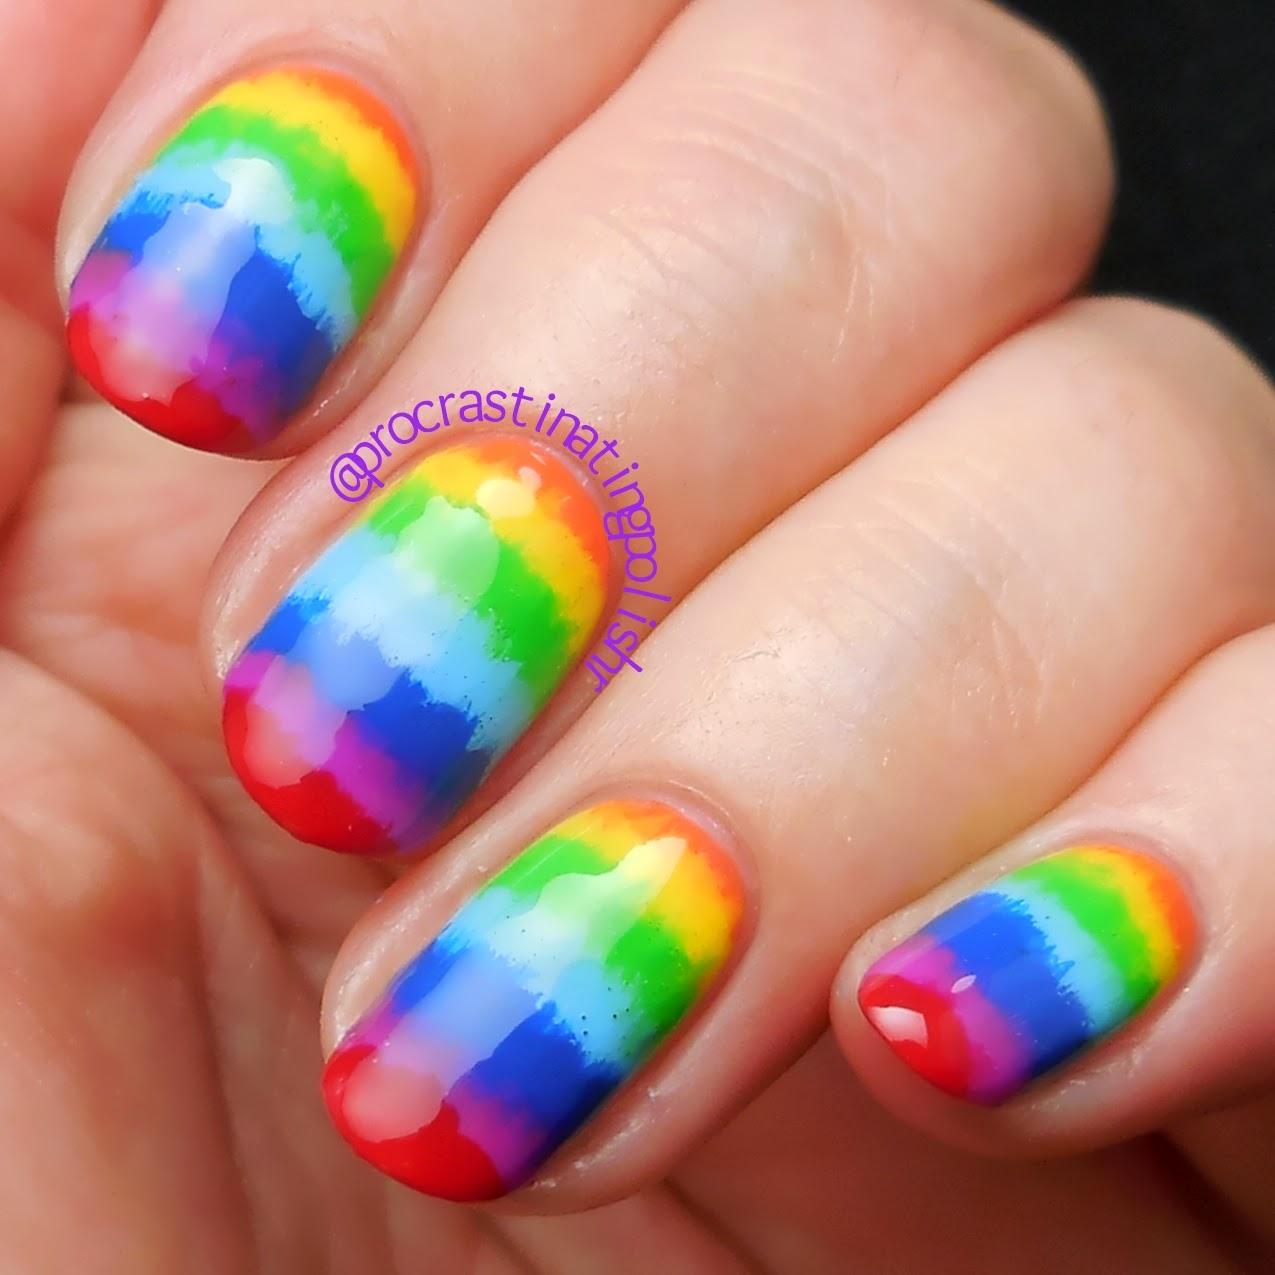 31 Day Challenge 2014 Day 9 - Rainbow